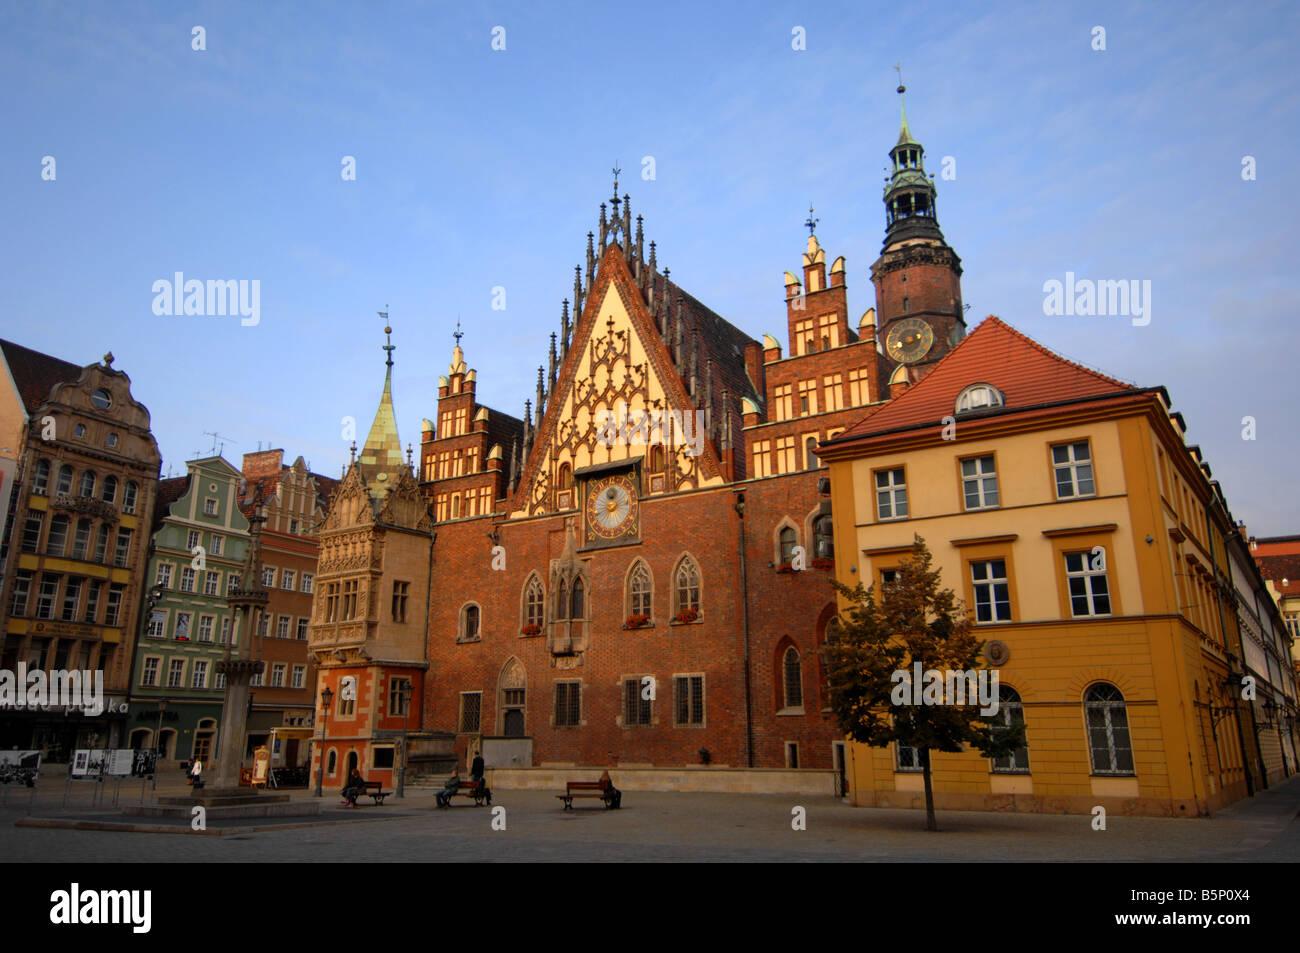 Town Hall, Rynek Square, Wroclaw, Poland - Stock Image